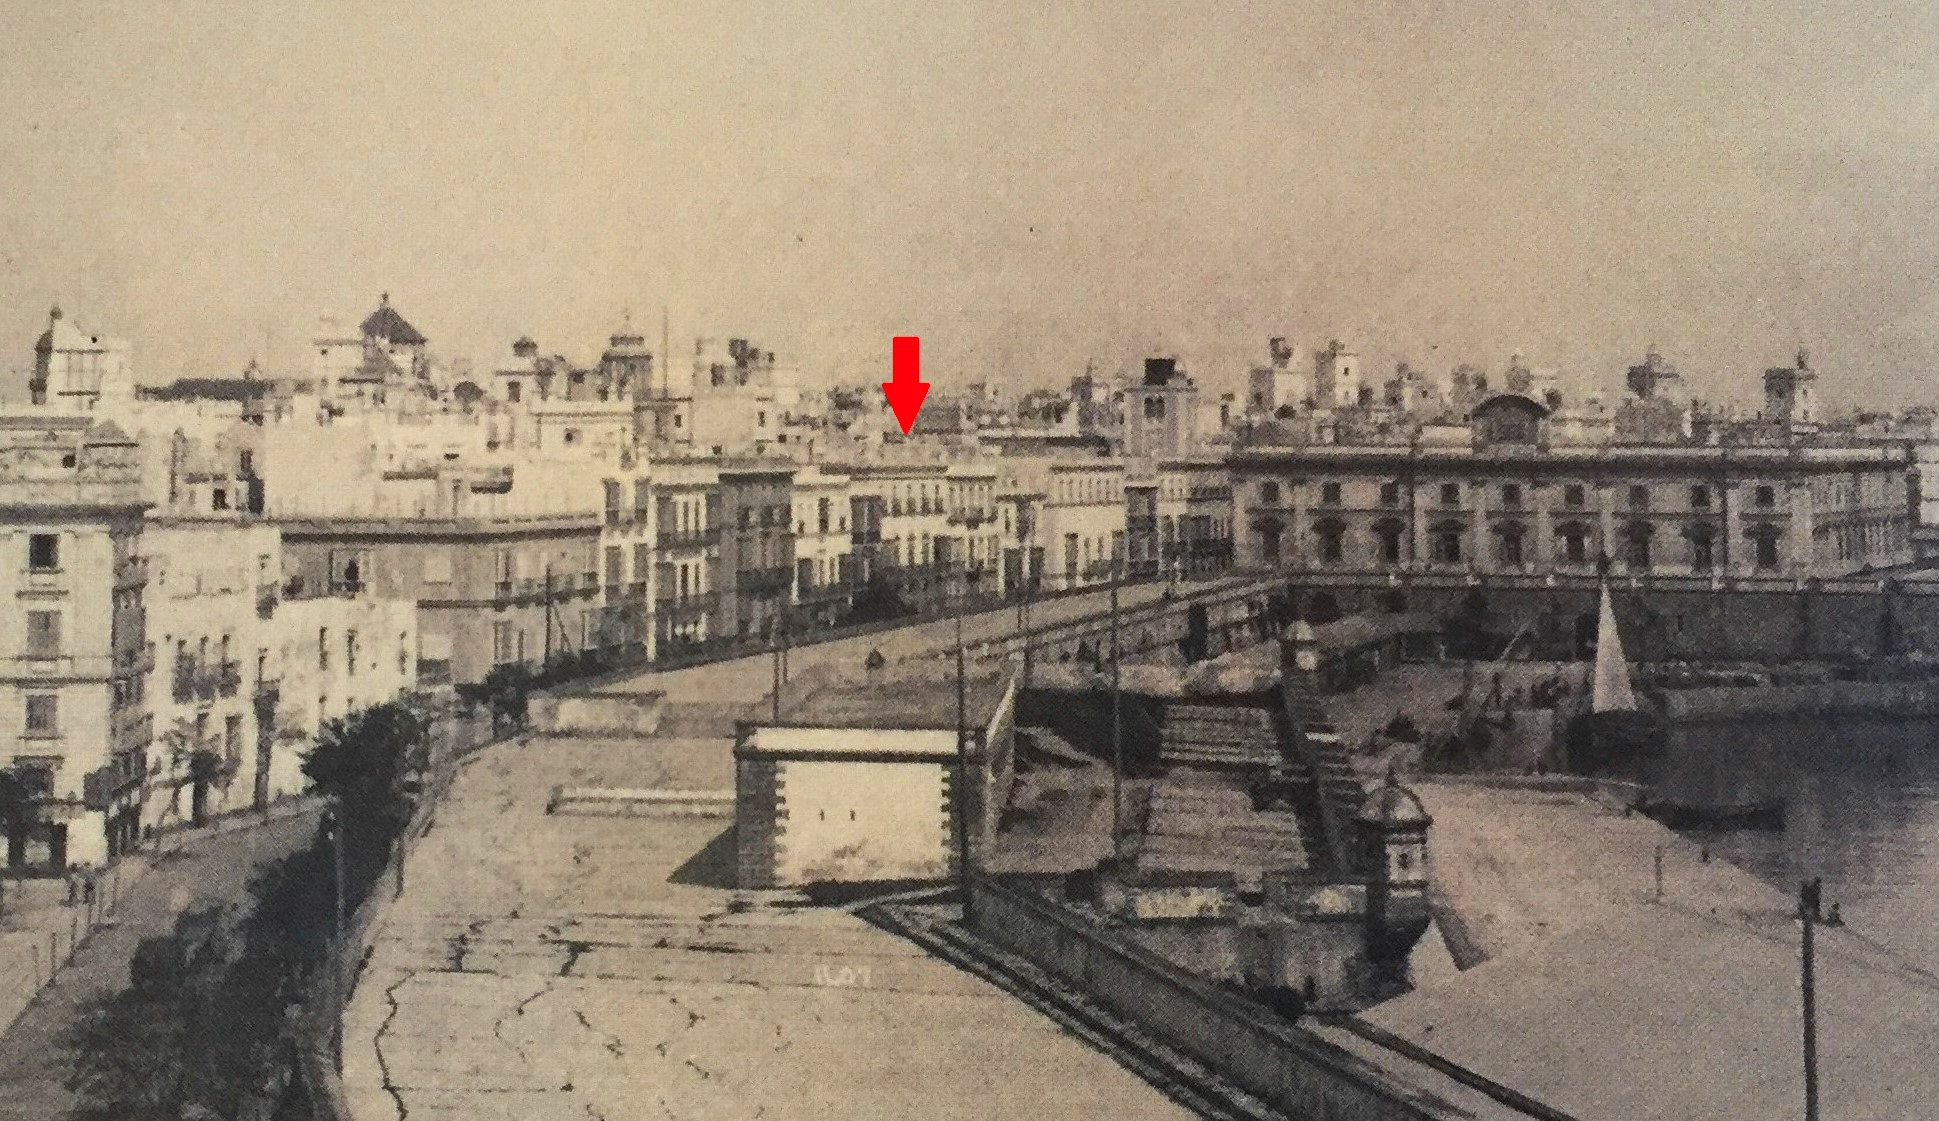 Residencia de Sebastián Martínez en Cádiz, frente a la Aduana, hacia 1887. Colección de Rafael Garófano (detalle).